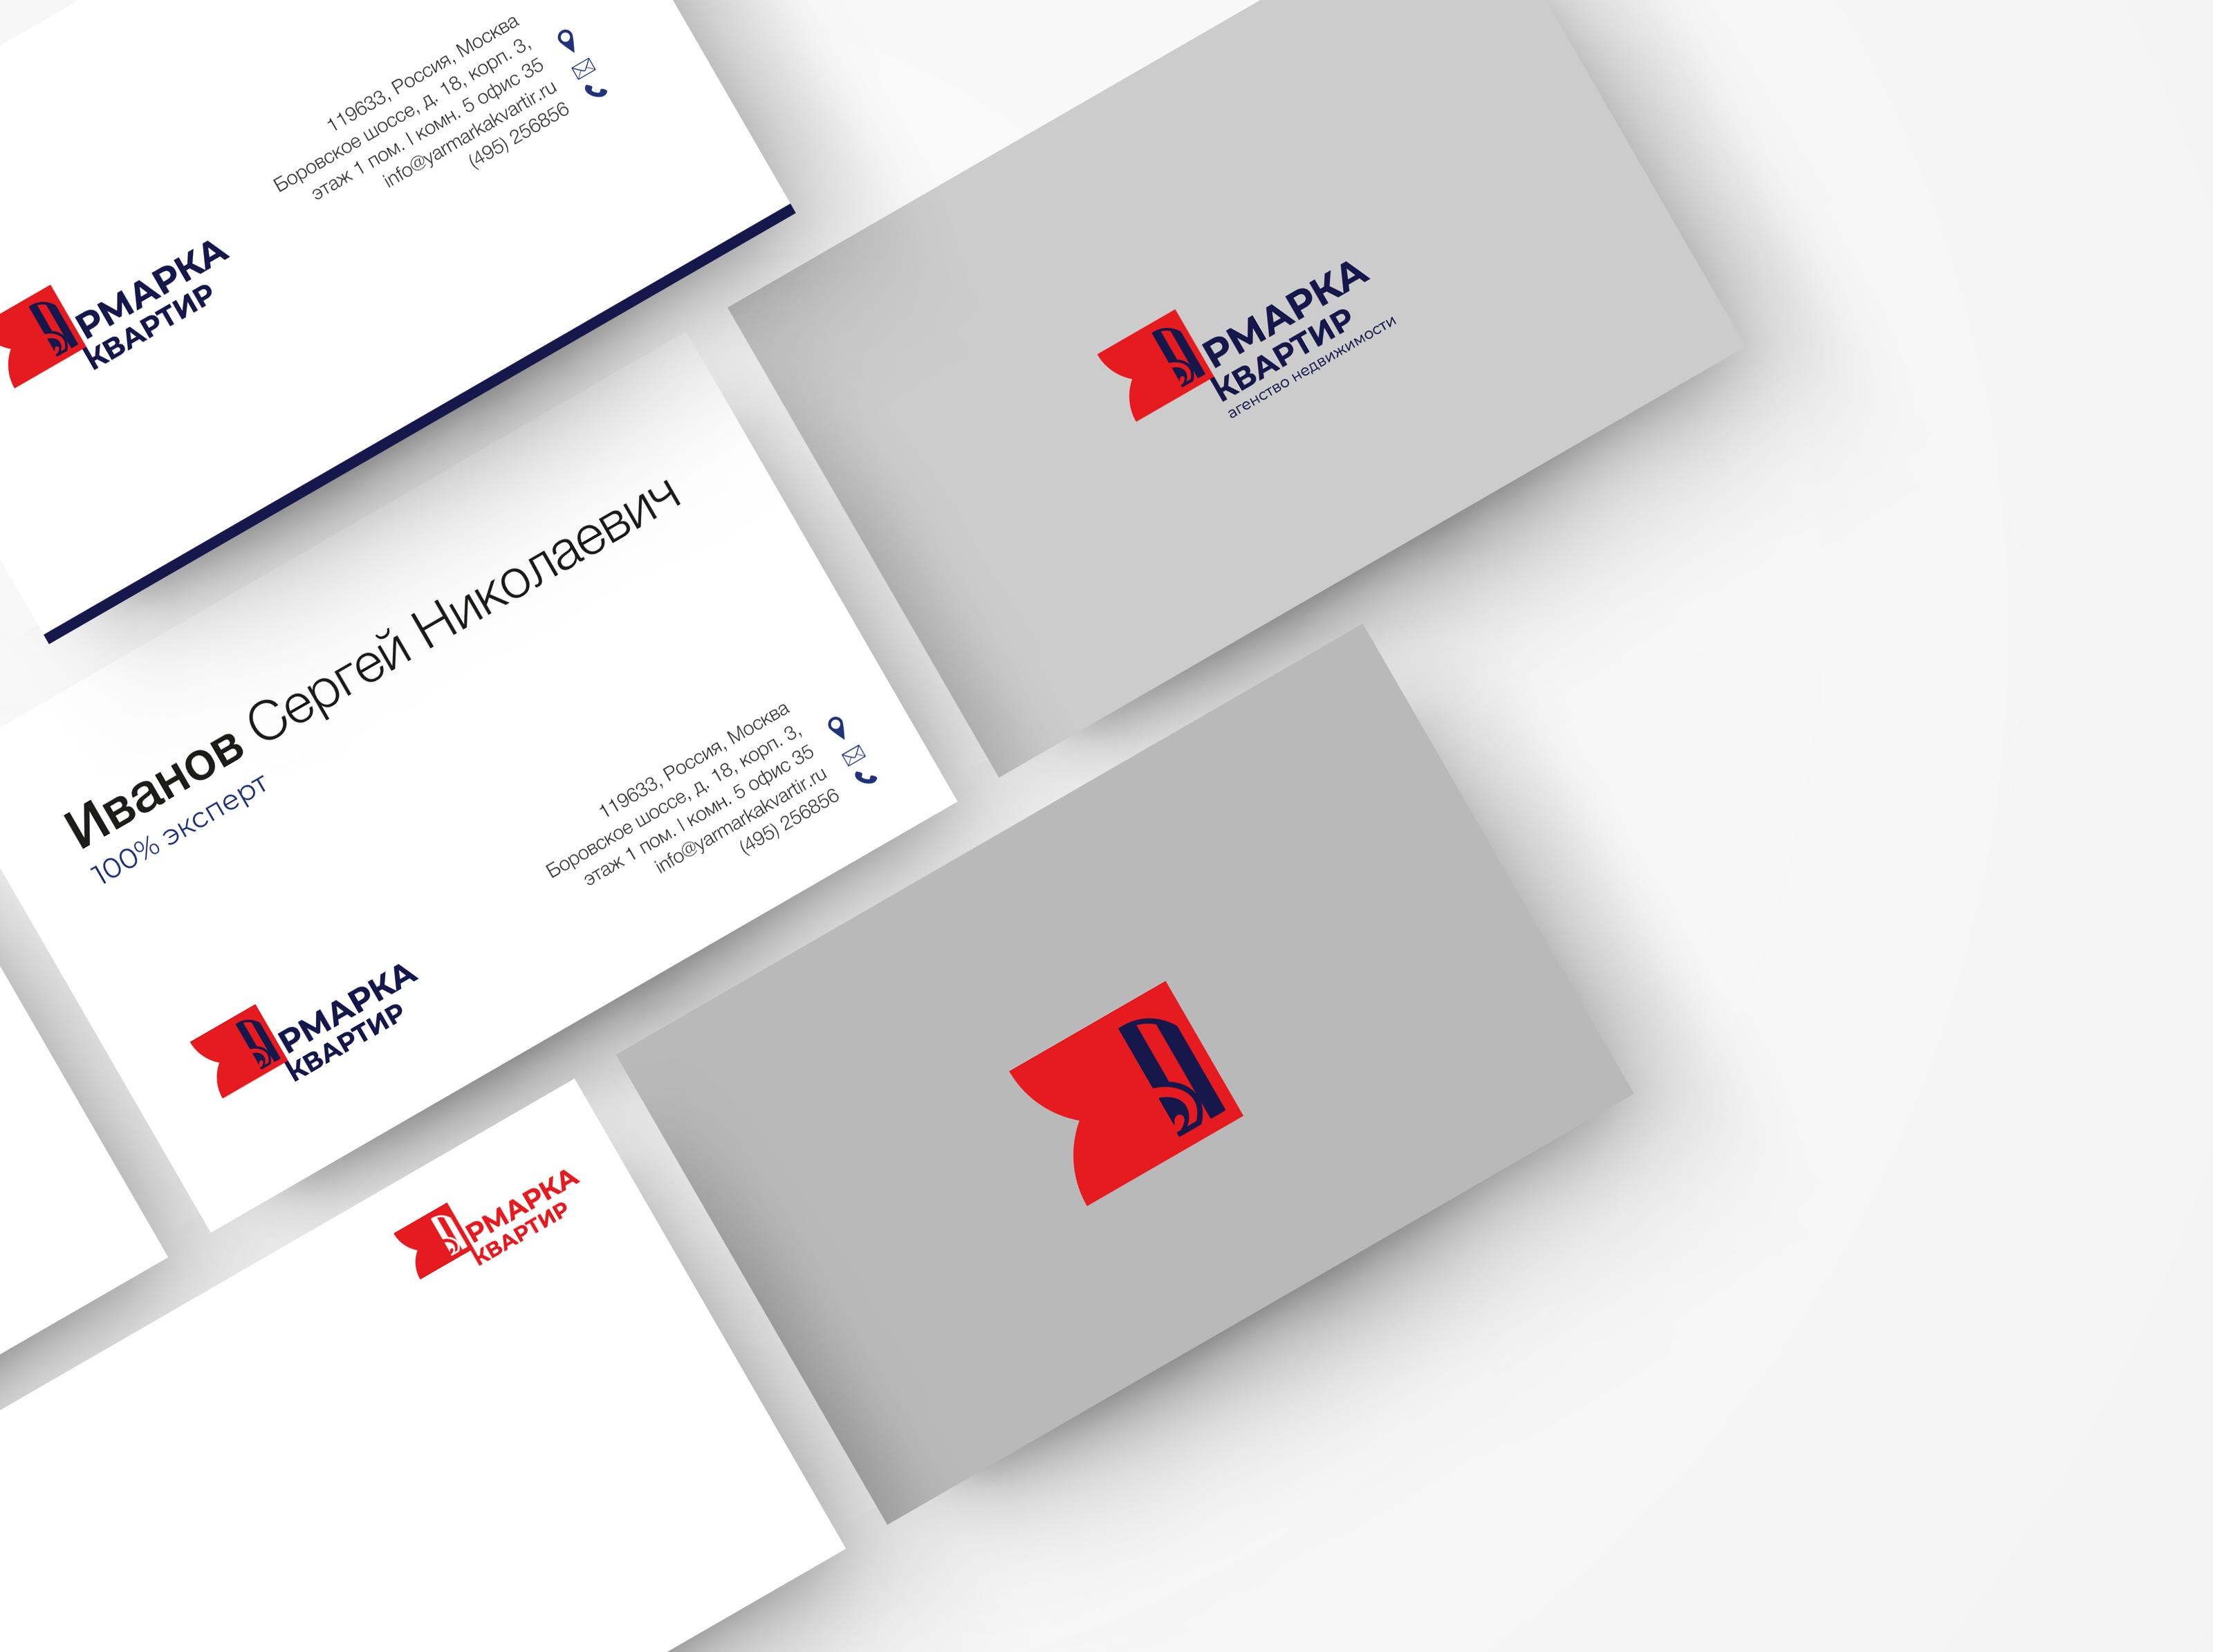 Создание логотипа, с вариантами для визитки и листовки фото f_920600b27148fd86.png